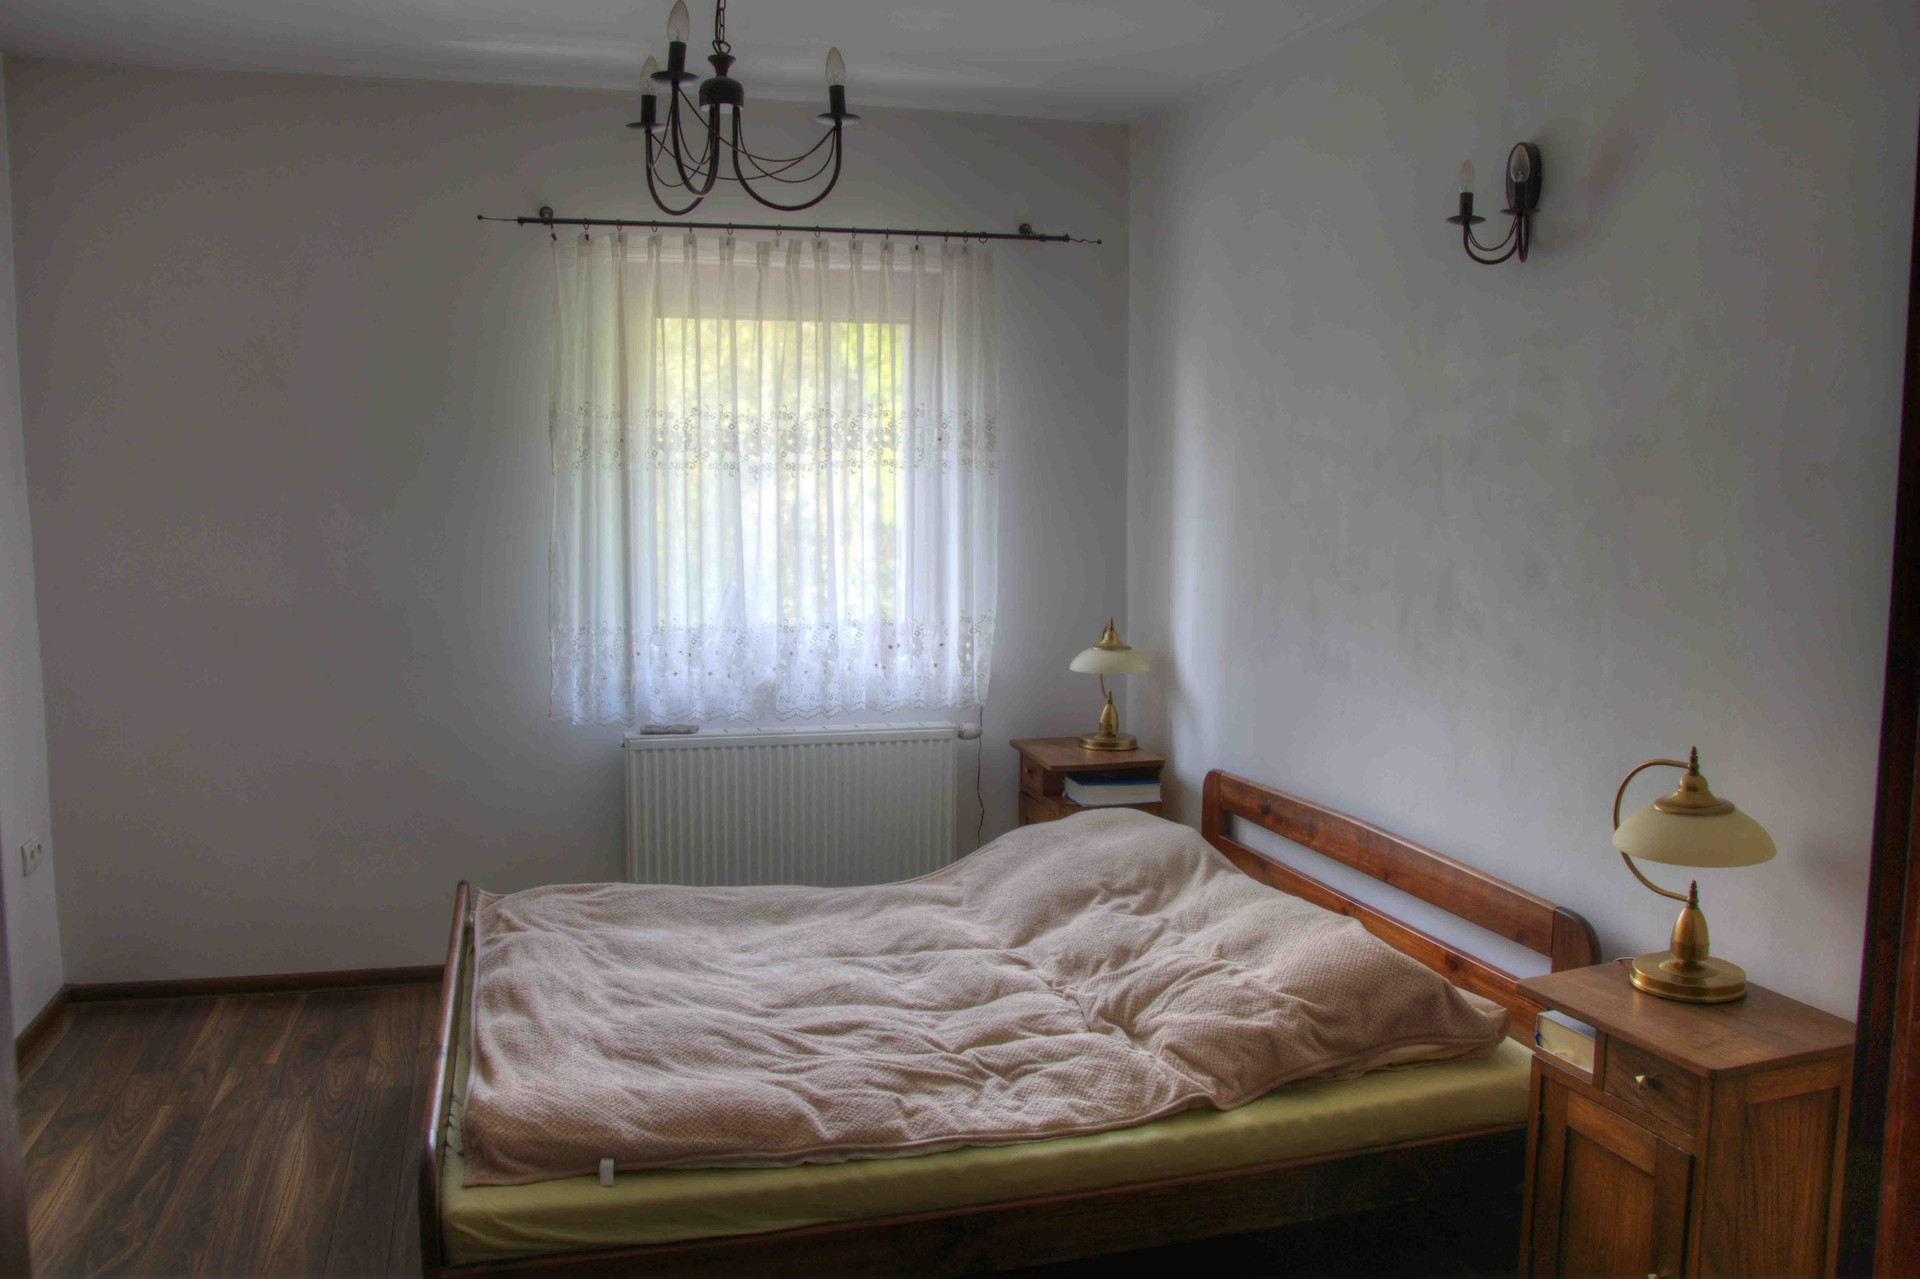 KATOWICE - BRYNOW - 90 sq meters | Flat rent Katowice